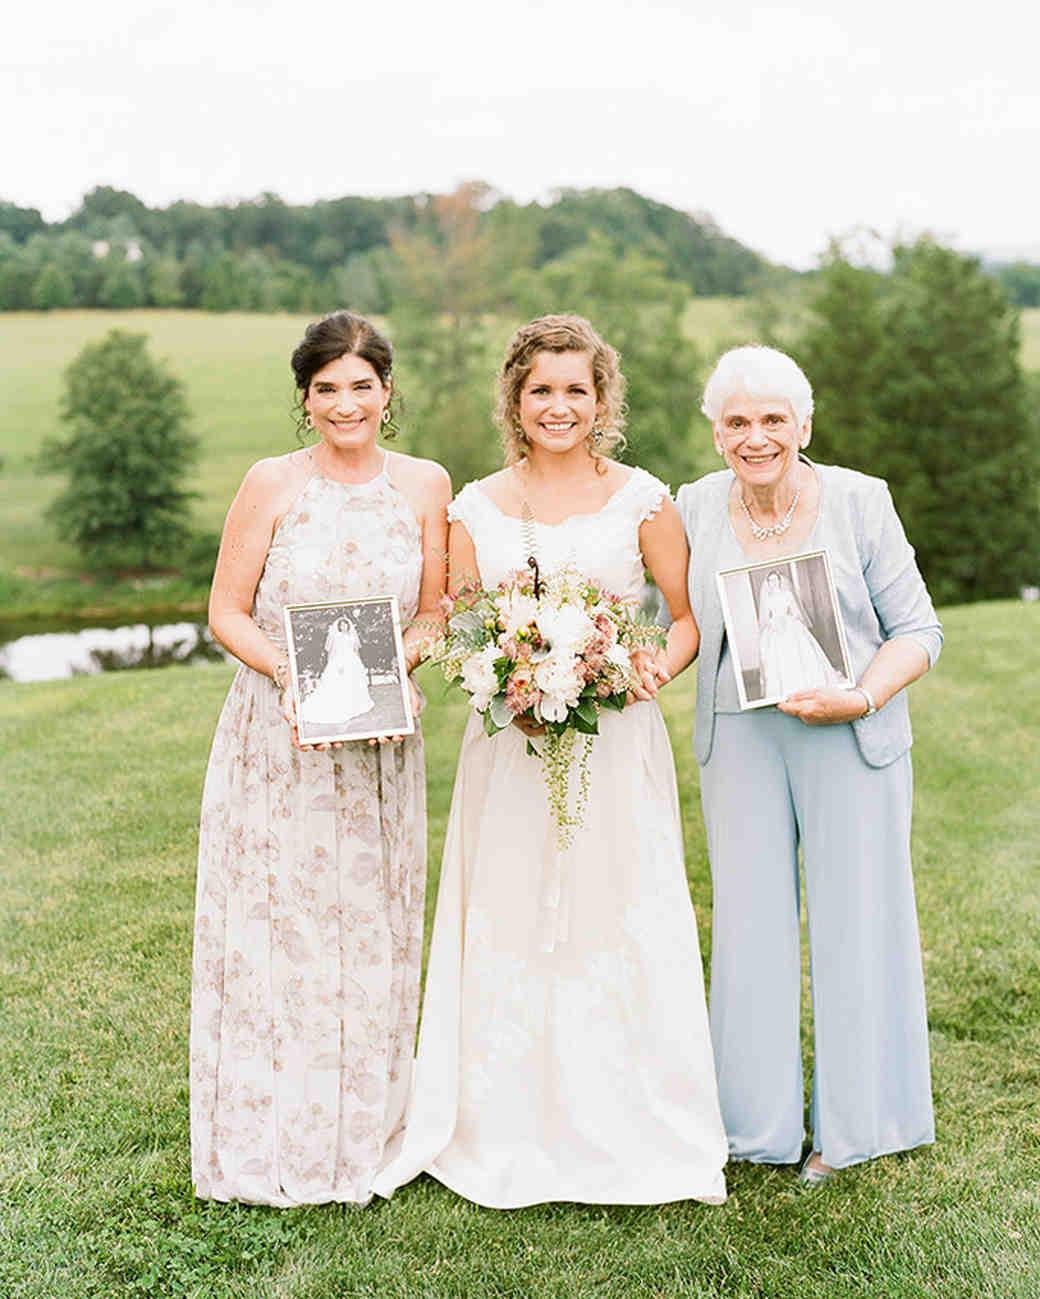 Wedding Gown For Parents: 55 Heartwarming Mother-Daughter Wedding Photos